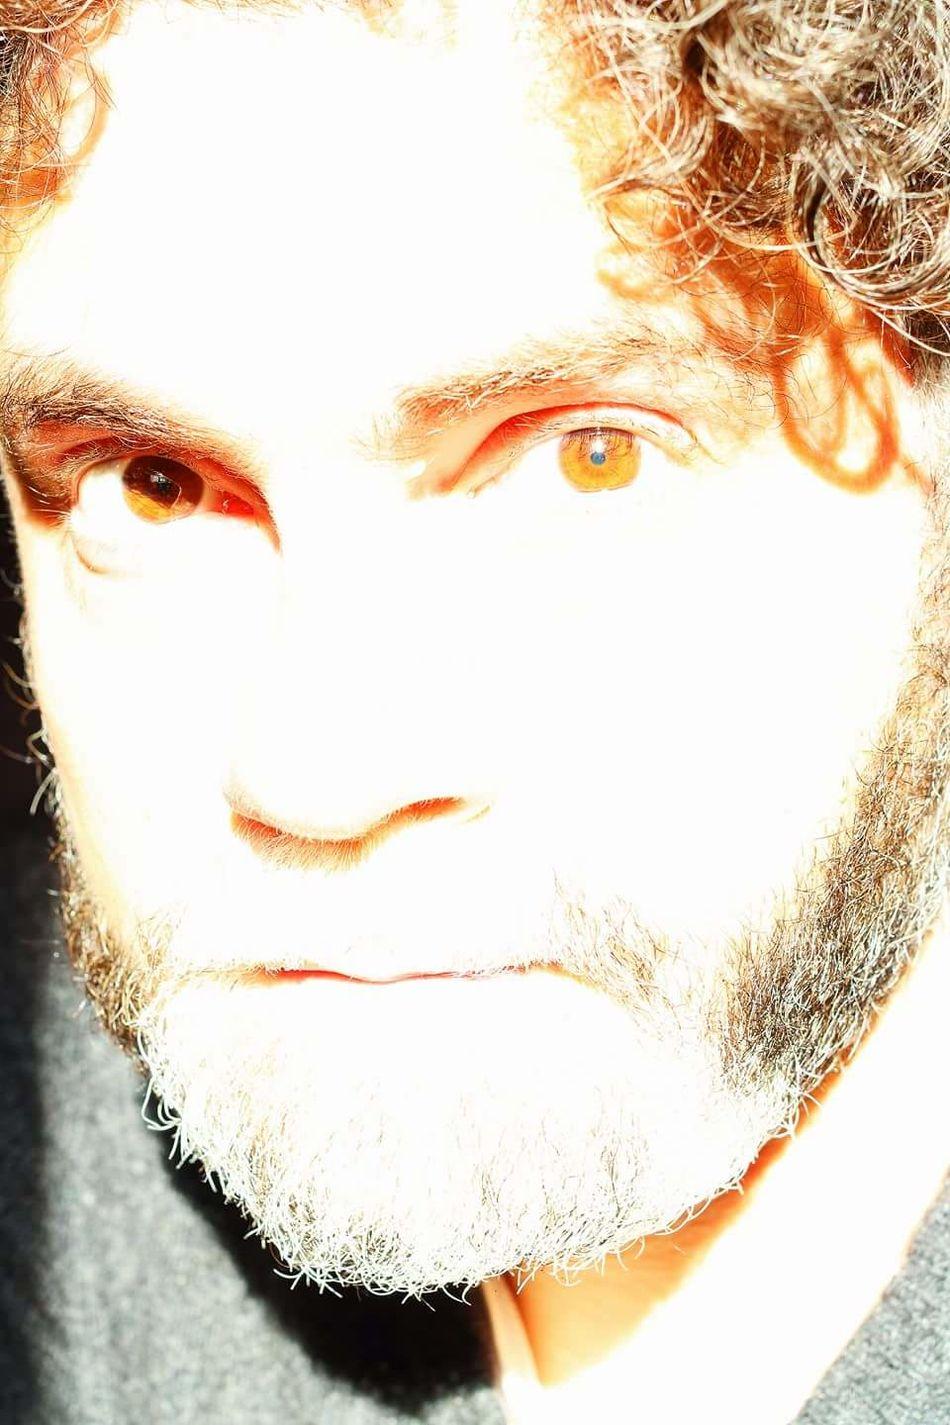 One Person Human Face Portrait Studiophotography PortraitPhotography Portrait Photography Beard Curly Facial Hair Formal Portrait Photooftheday Studio Photography Photostudio Photoshoot